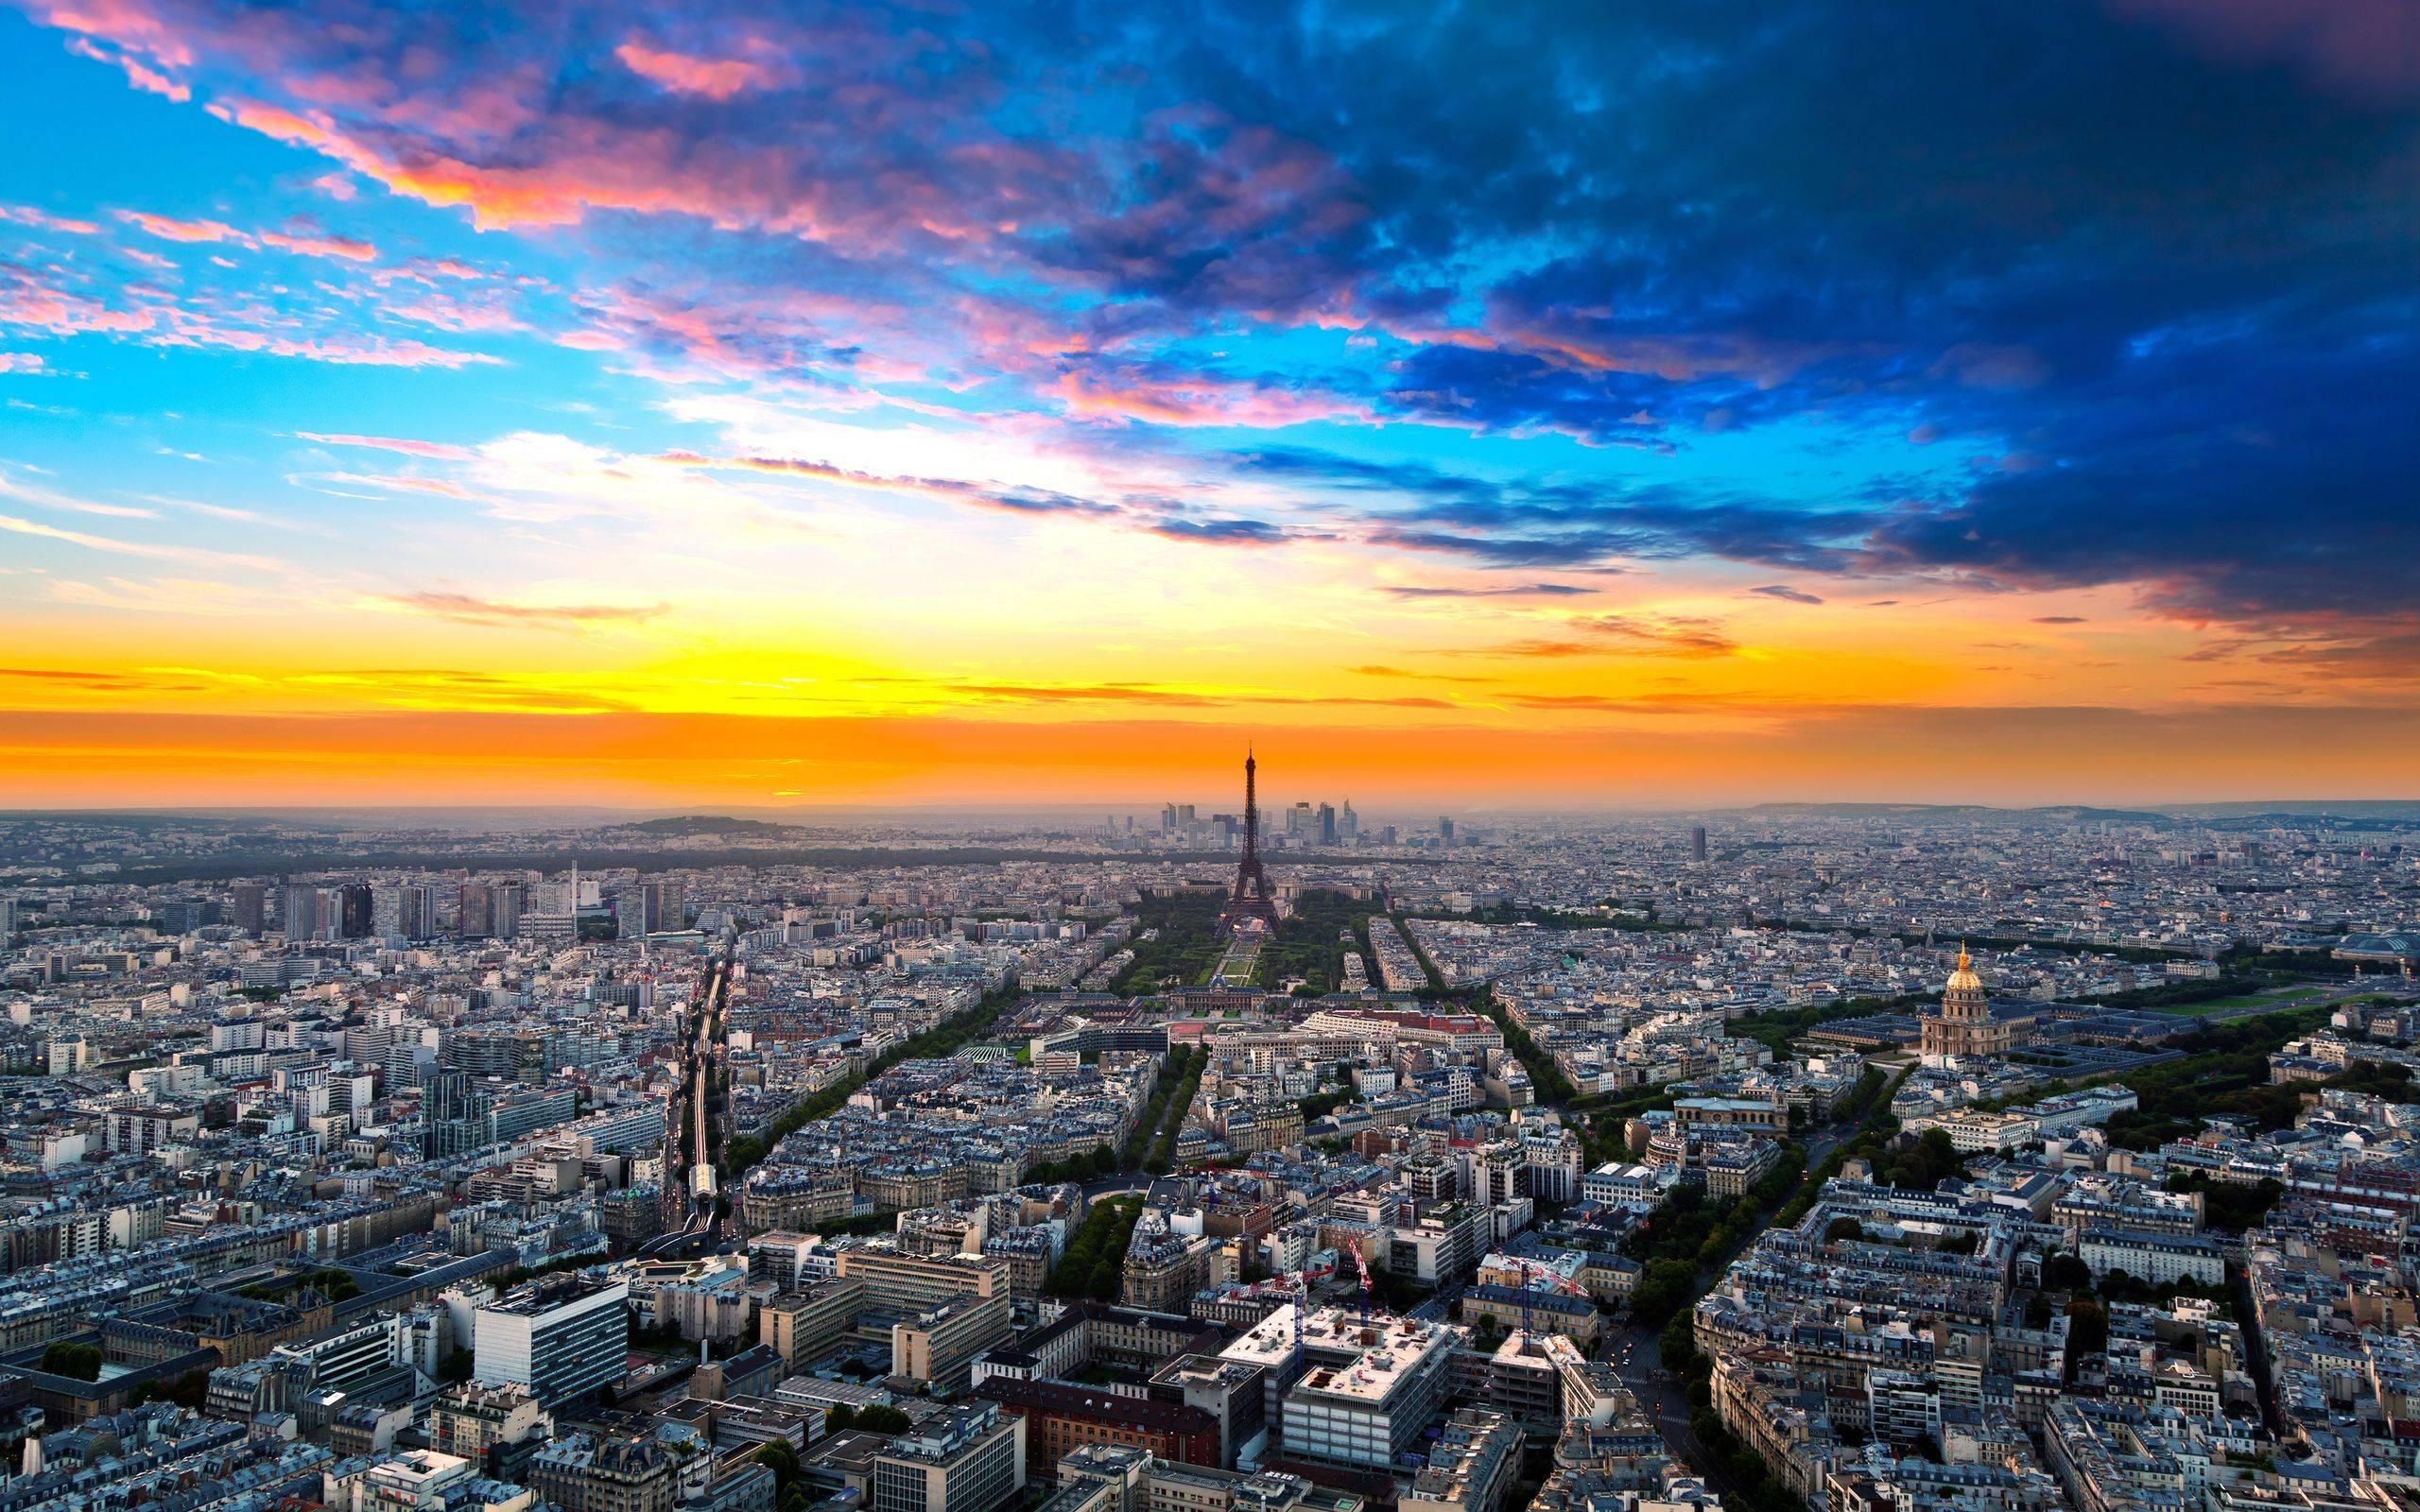 Paris Desktop Wallpapers FREE on Latoro.com